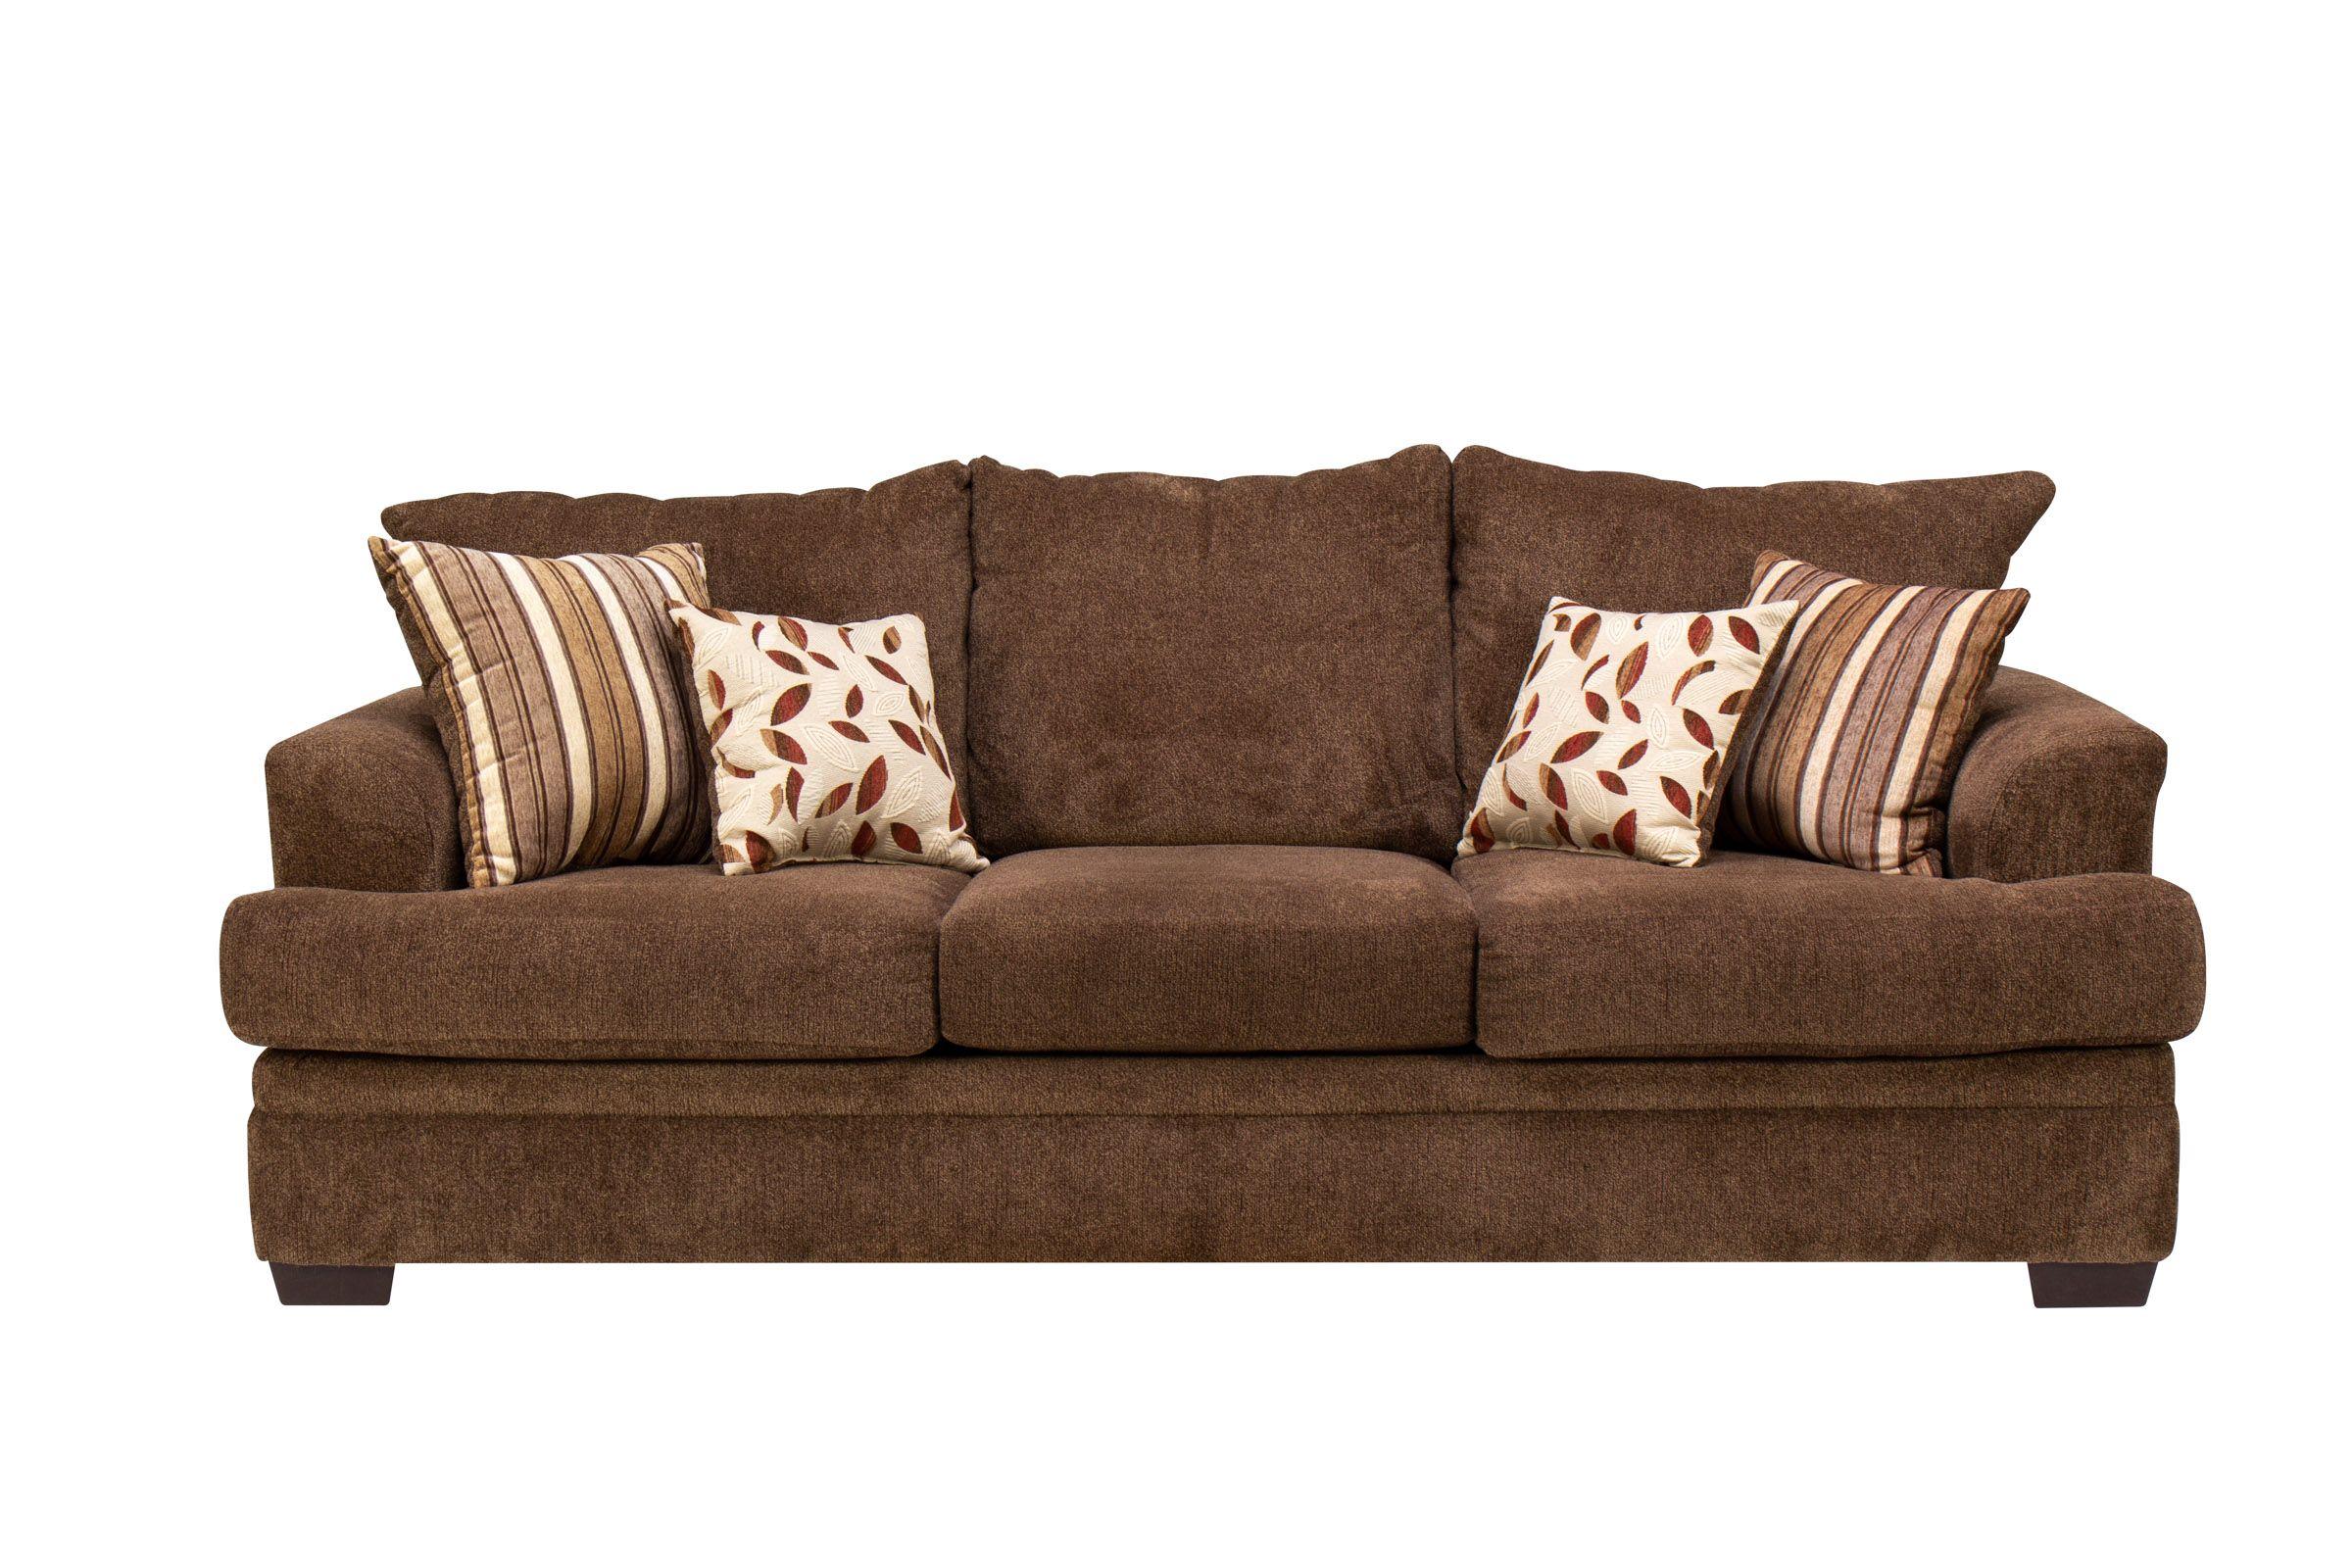 Super Bingham Chenille Sofa Download Free Architecture Designs Scobabritishbridgeorg